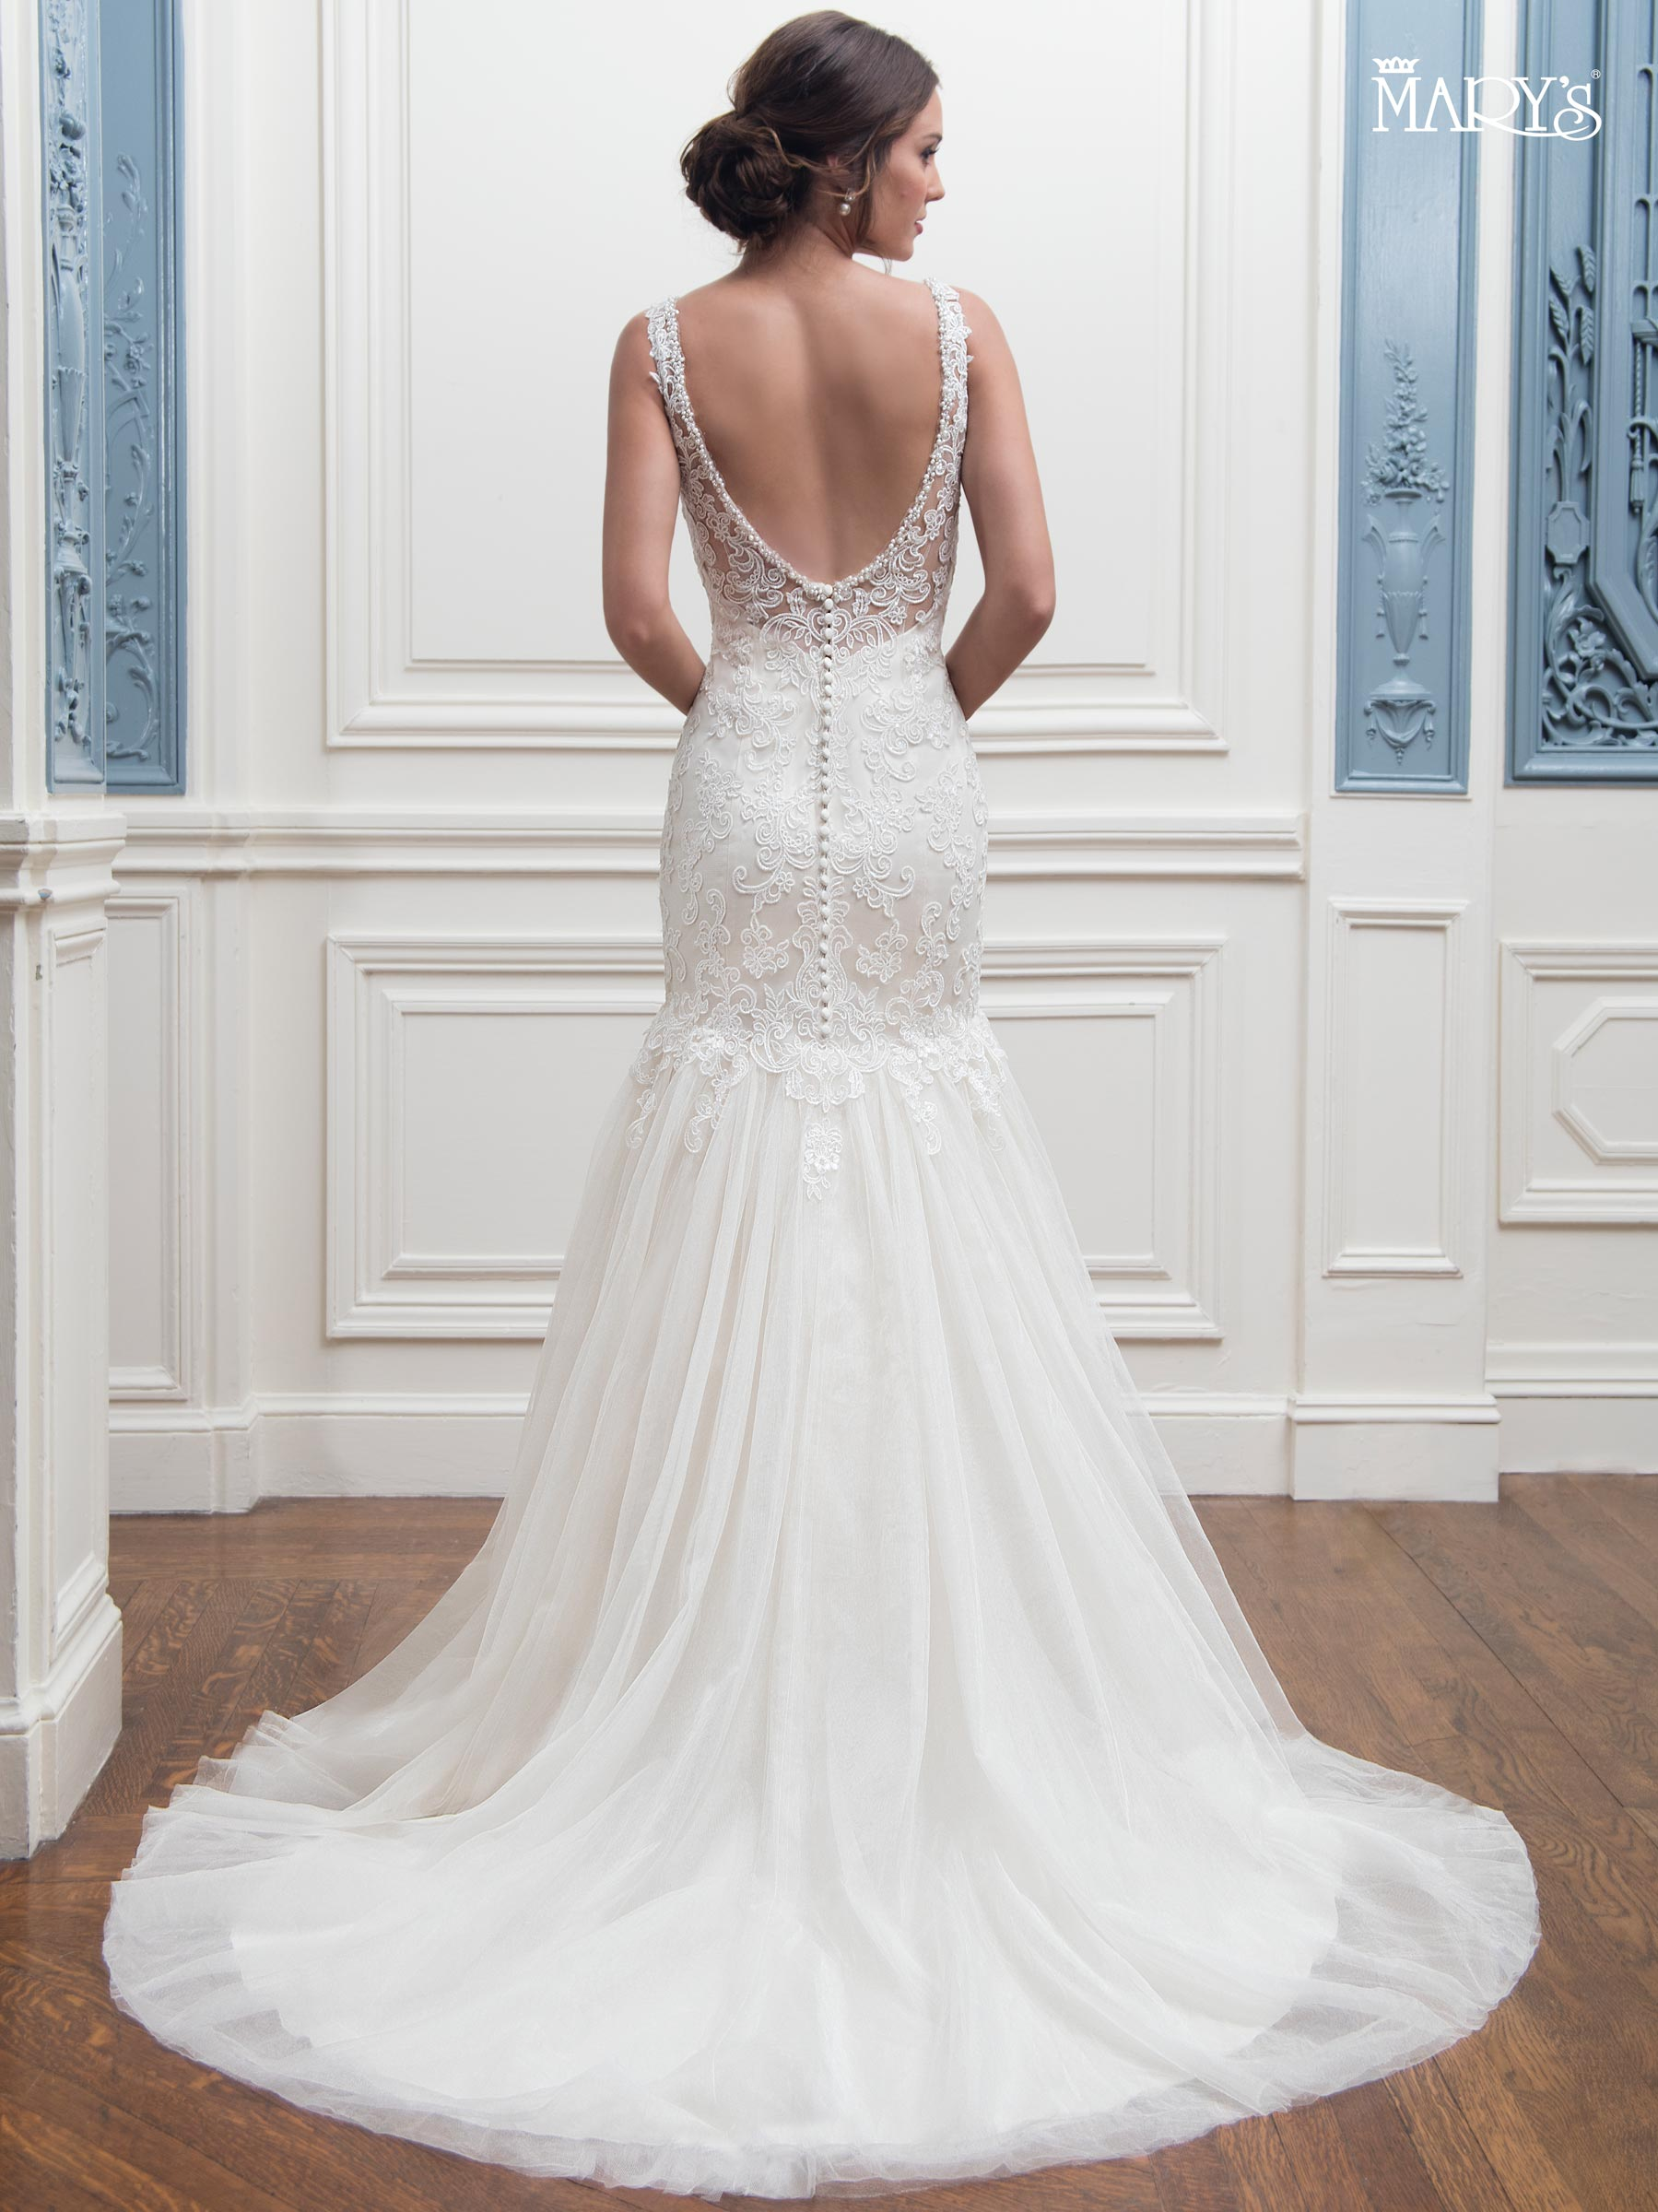 Bridal Wedding Dresses | Mary's | Style - MB3004